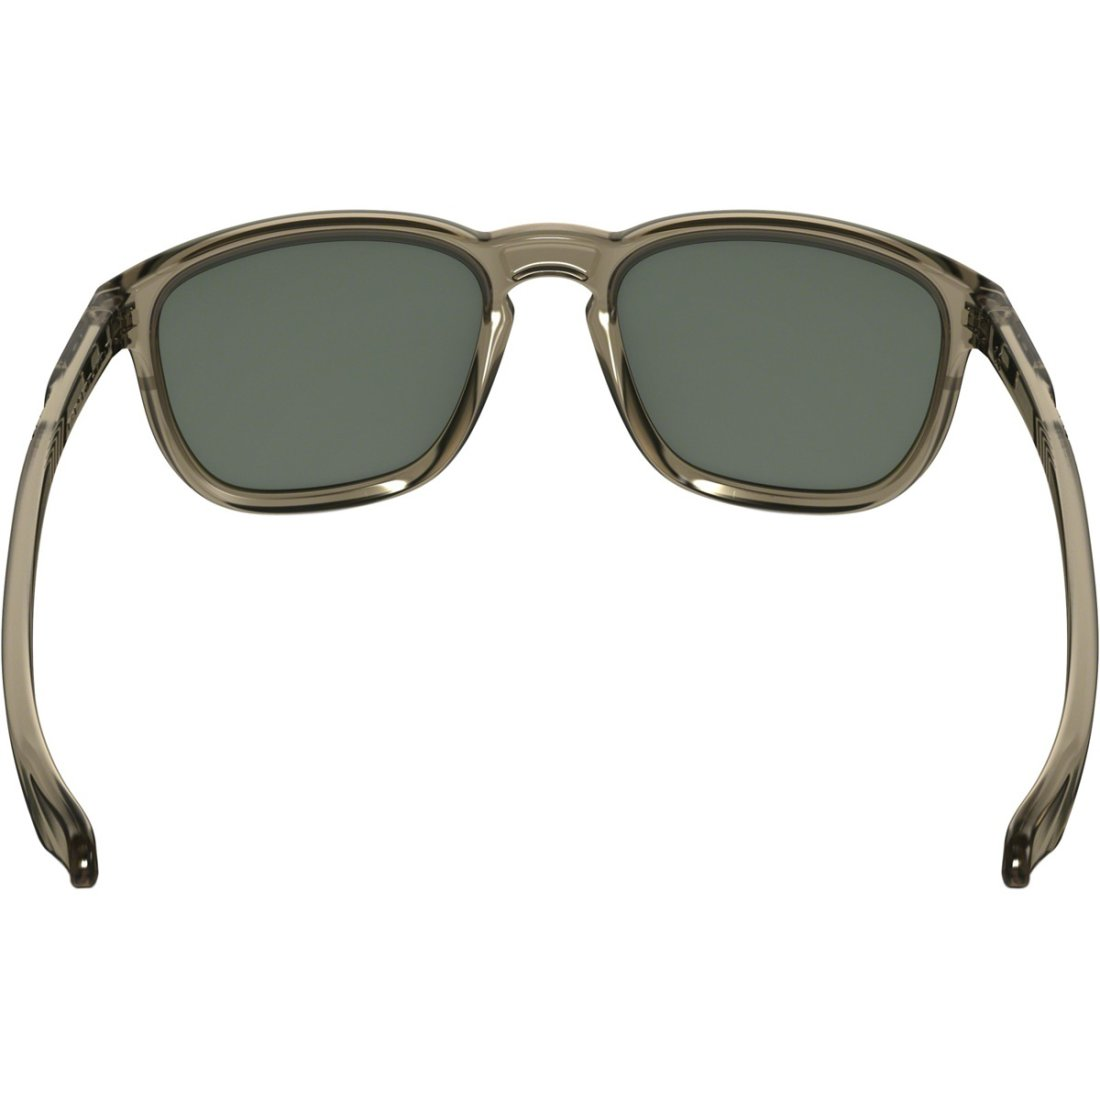 817a9602db OAKLEY Enduro Ink Collection Sepia   Dark Grey Sun glasses · Motocard